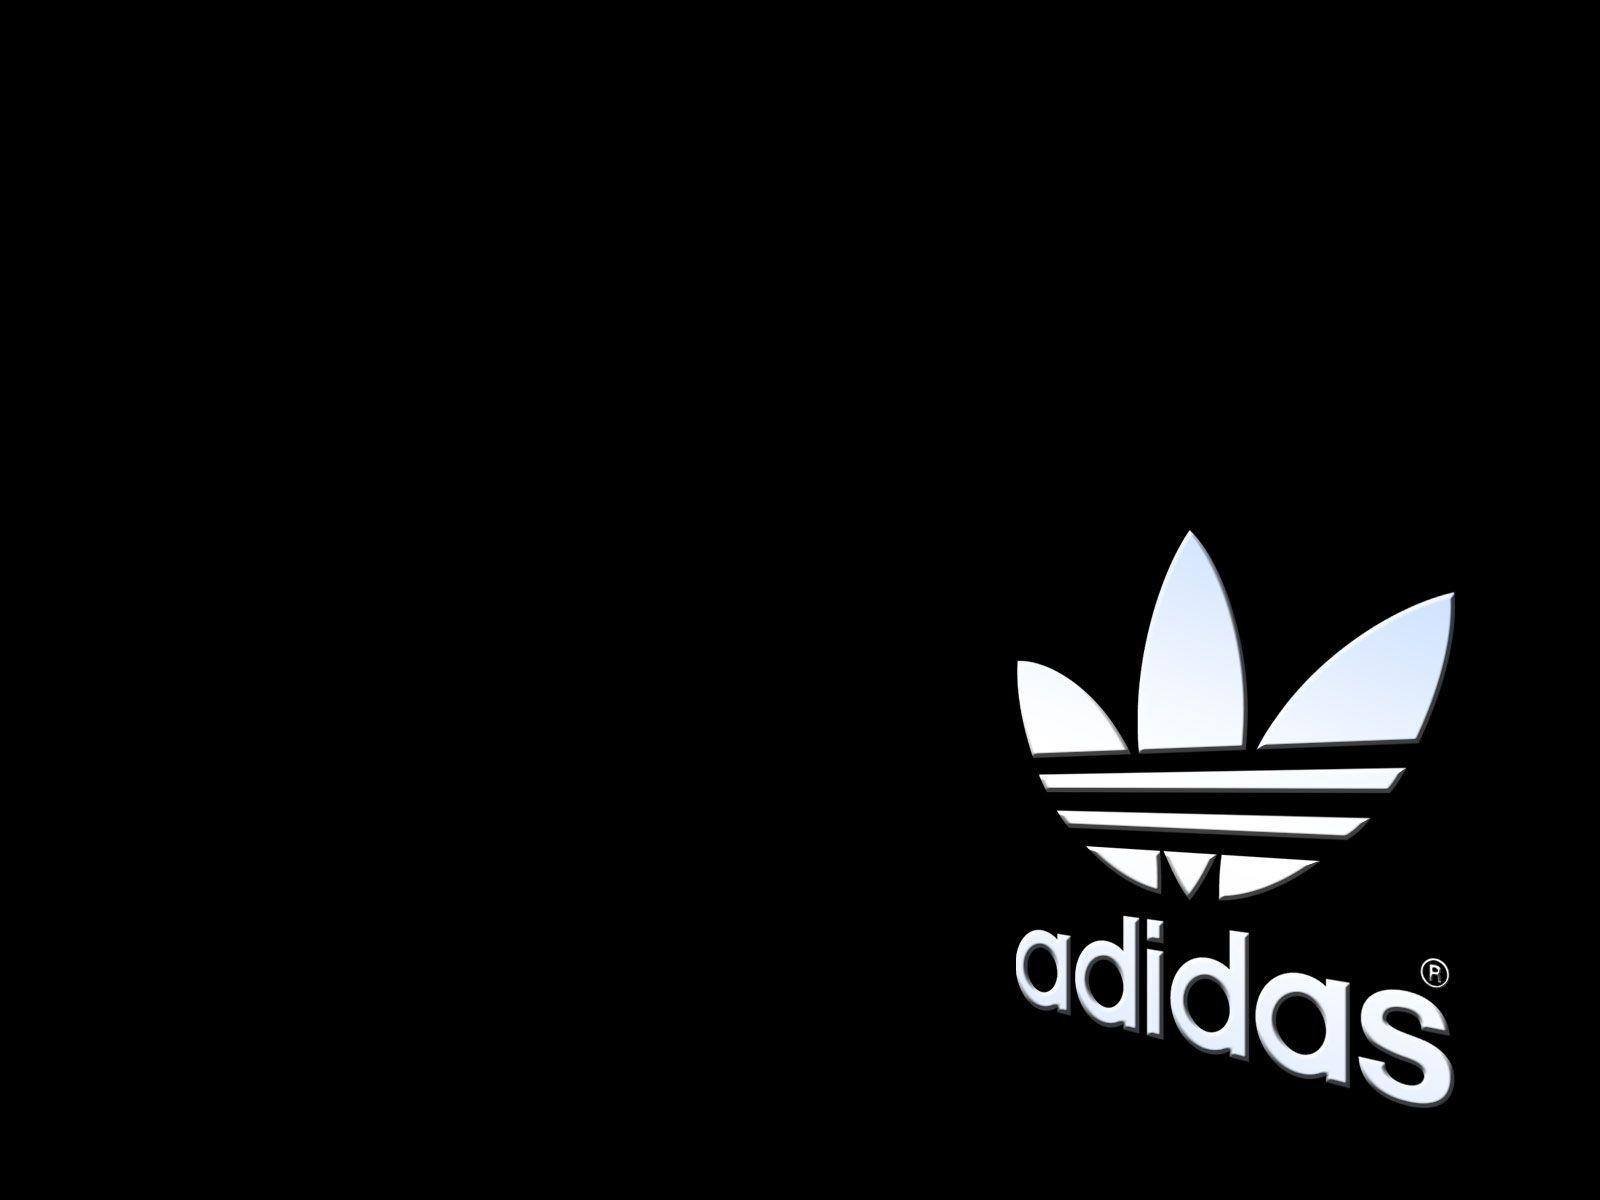 Adidas Wallpapers Free Download Pcadidas Wallpapers Free Download Pc